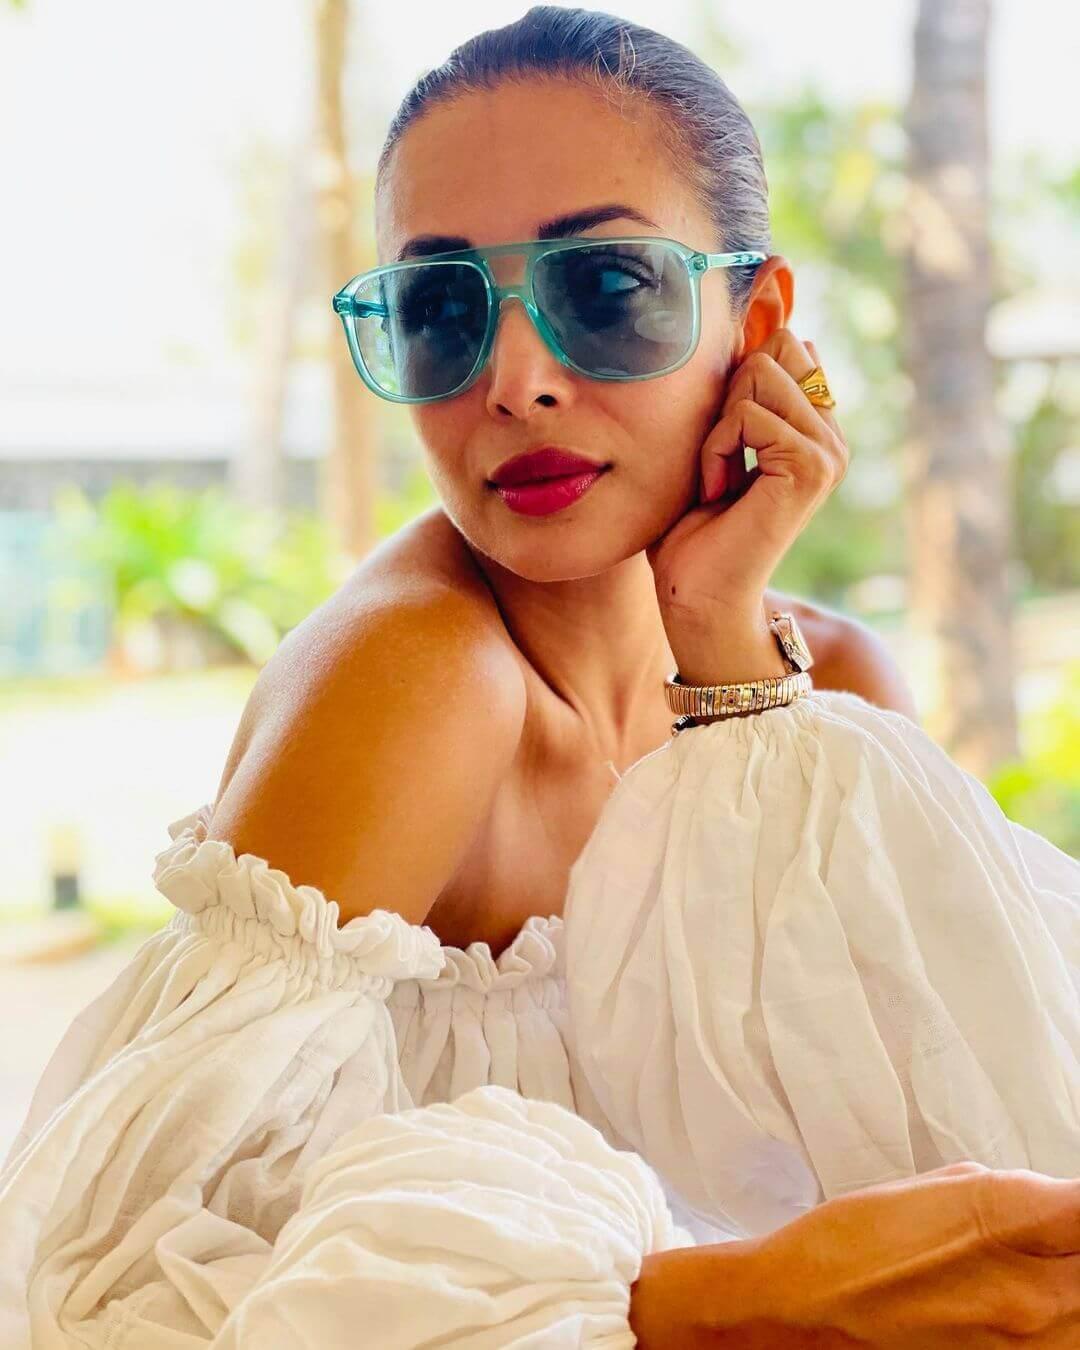 Actors Gossips: Malaika Arora shares sizzling photo flaunting bikini body, captions it beach bum